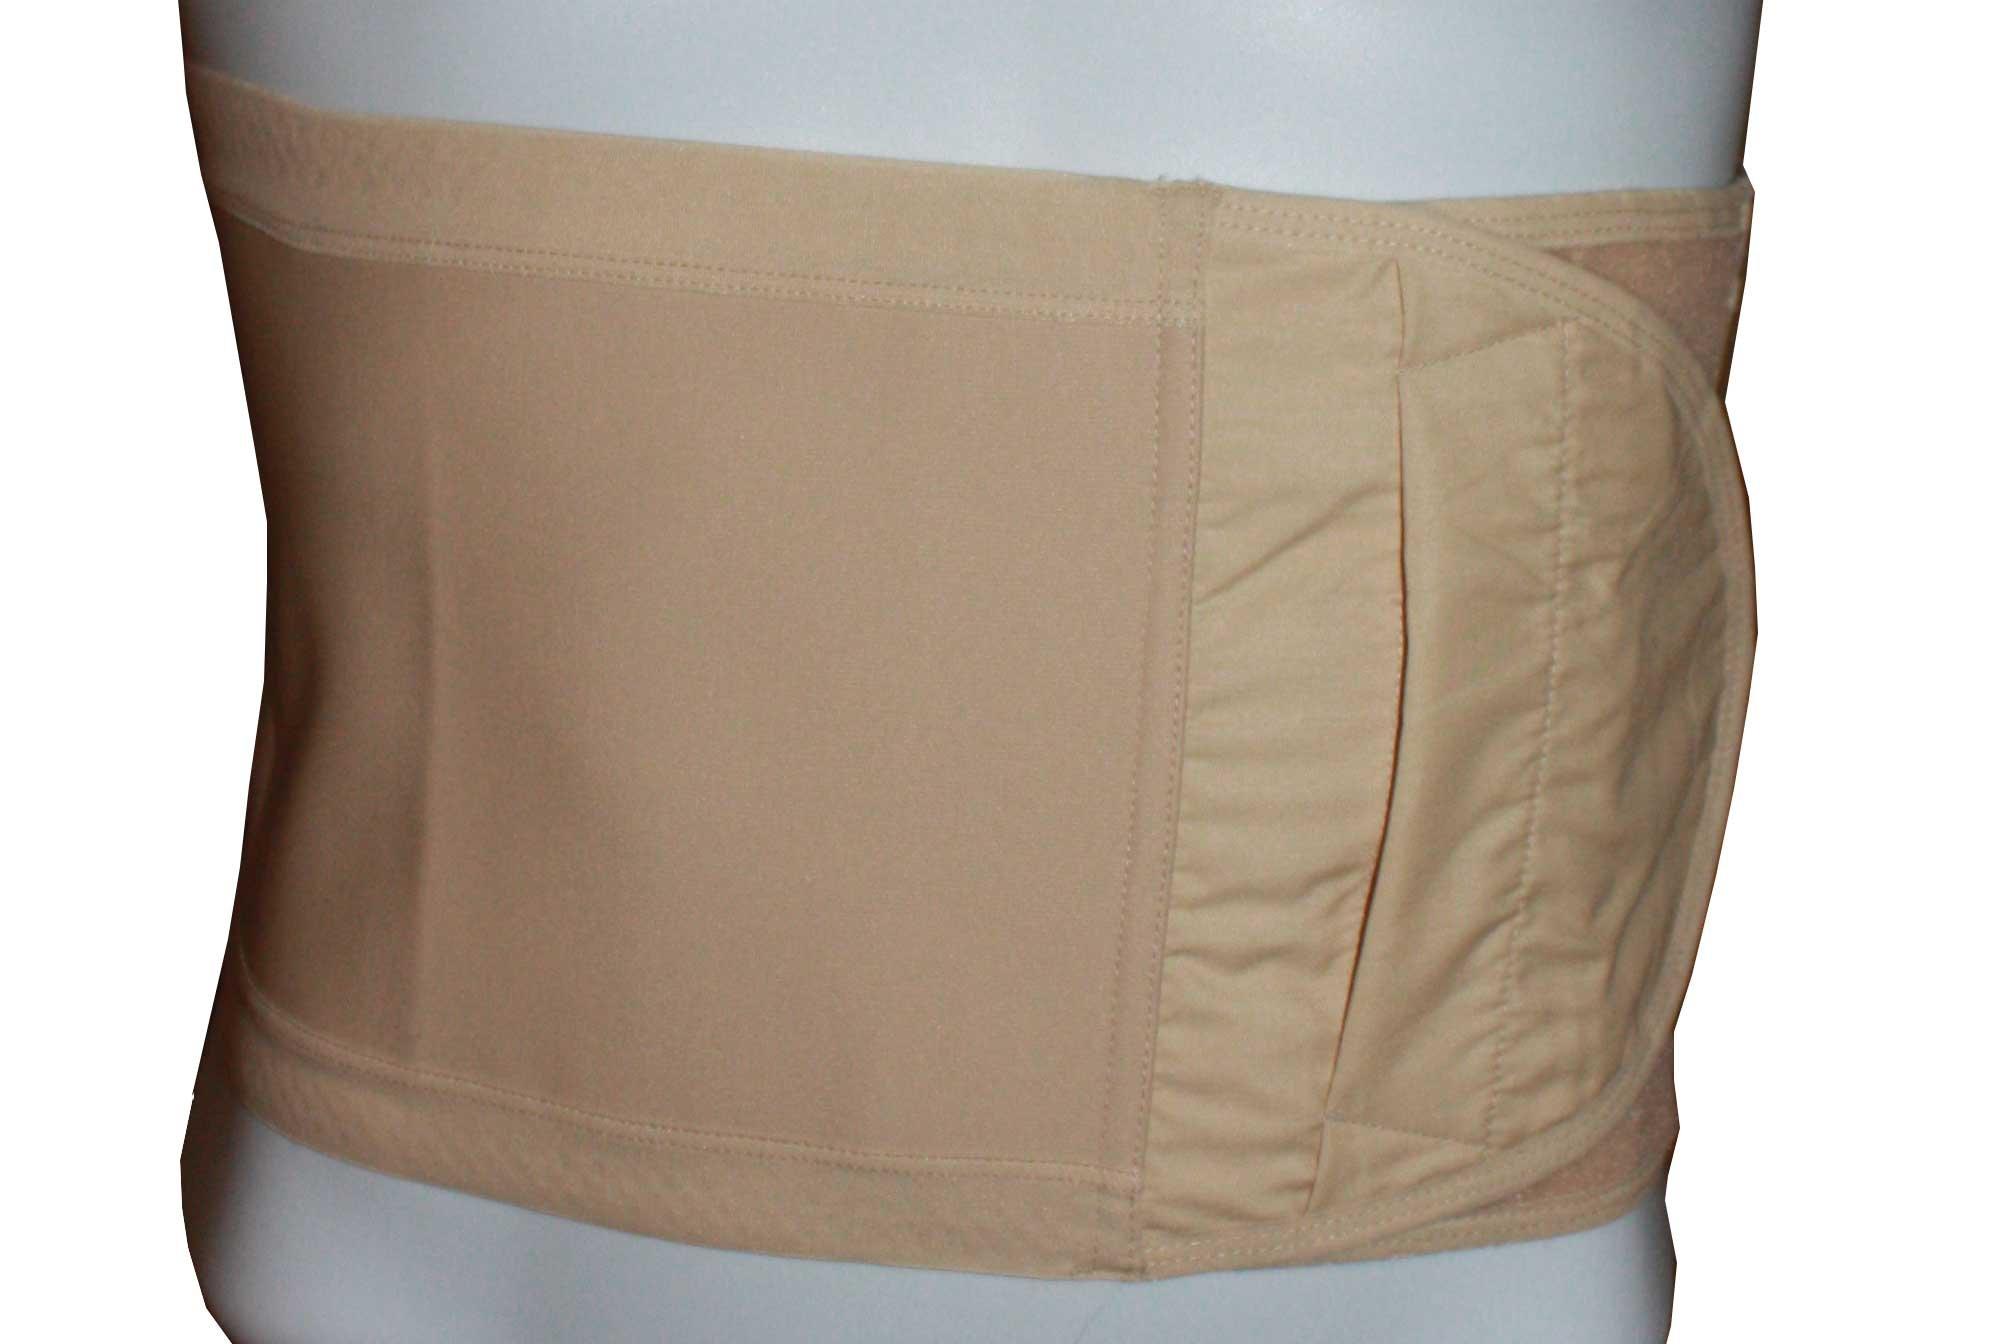 Safe n' Simple Hernia Support Belt, 26cm, Beige, Medium